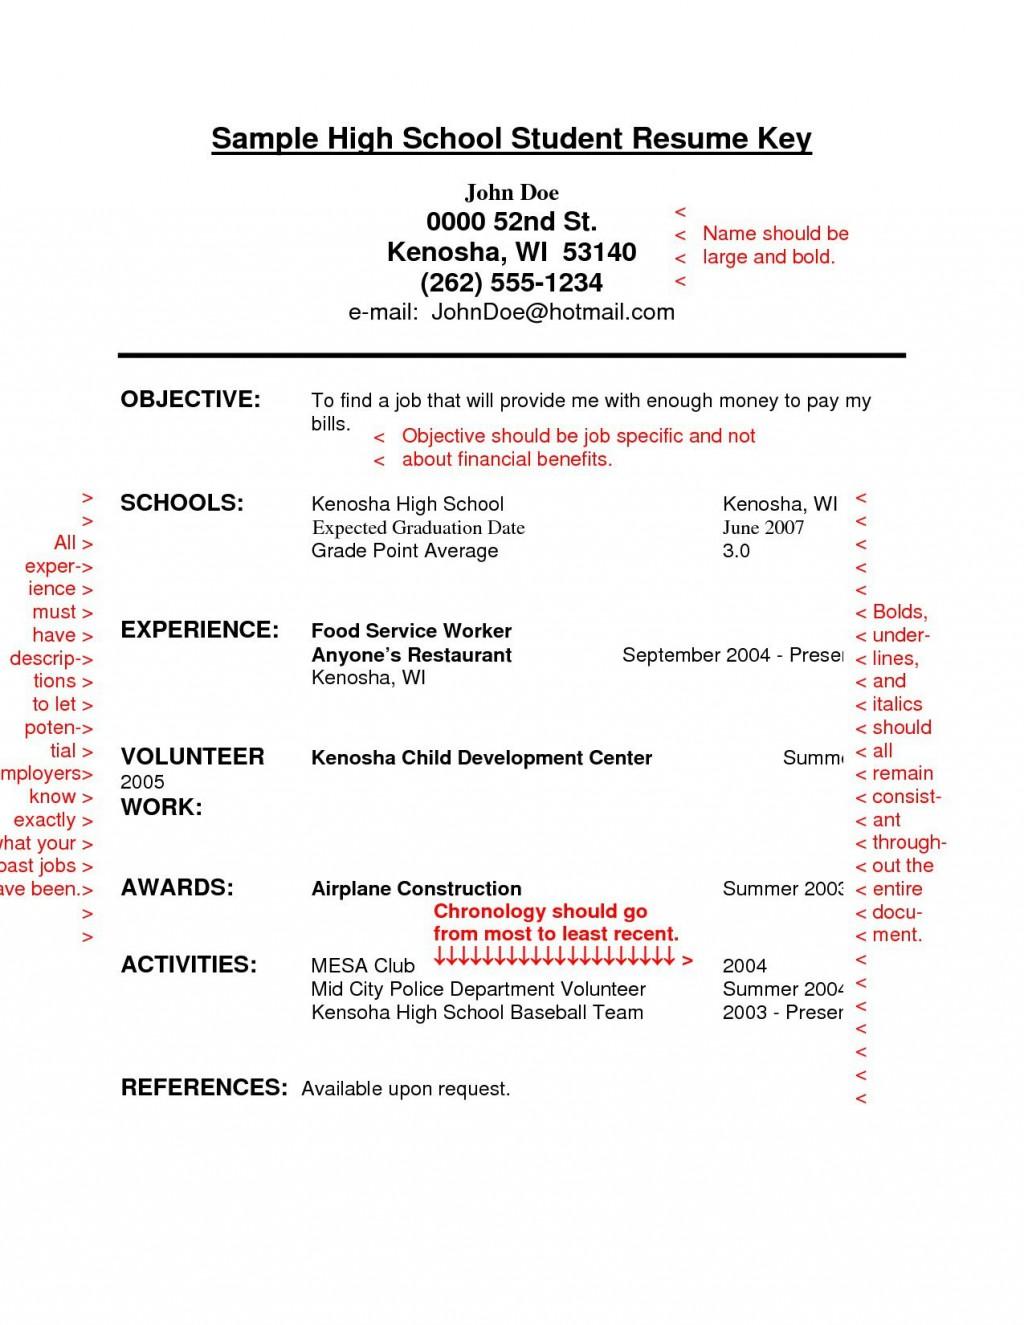 Free Student Resume Templates Addictionary